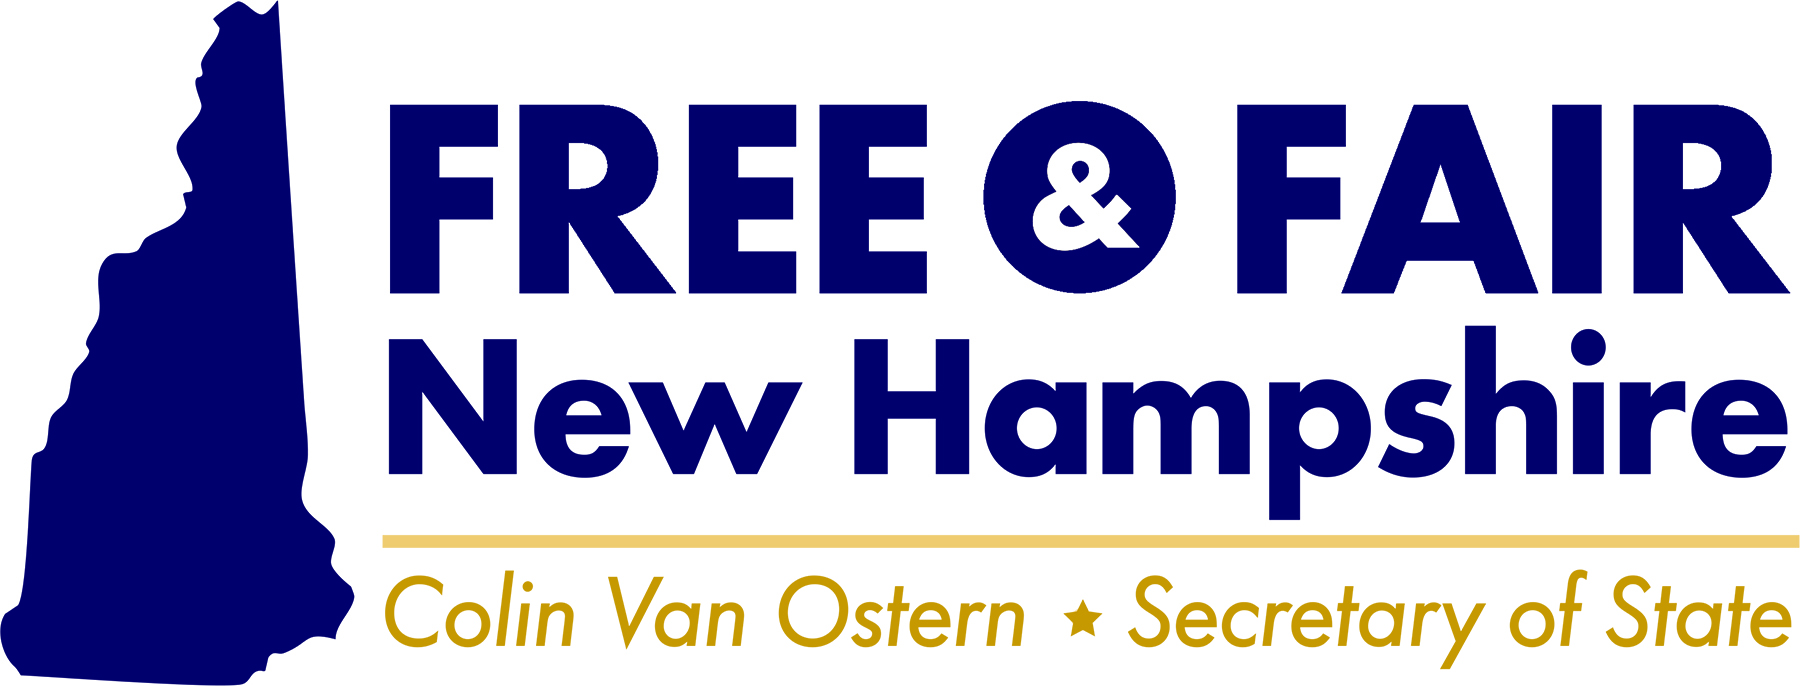 Free & Fair New Hampshire